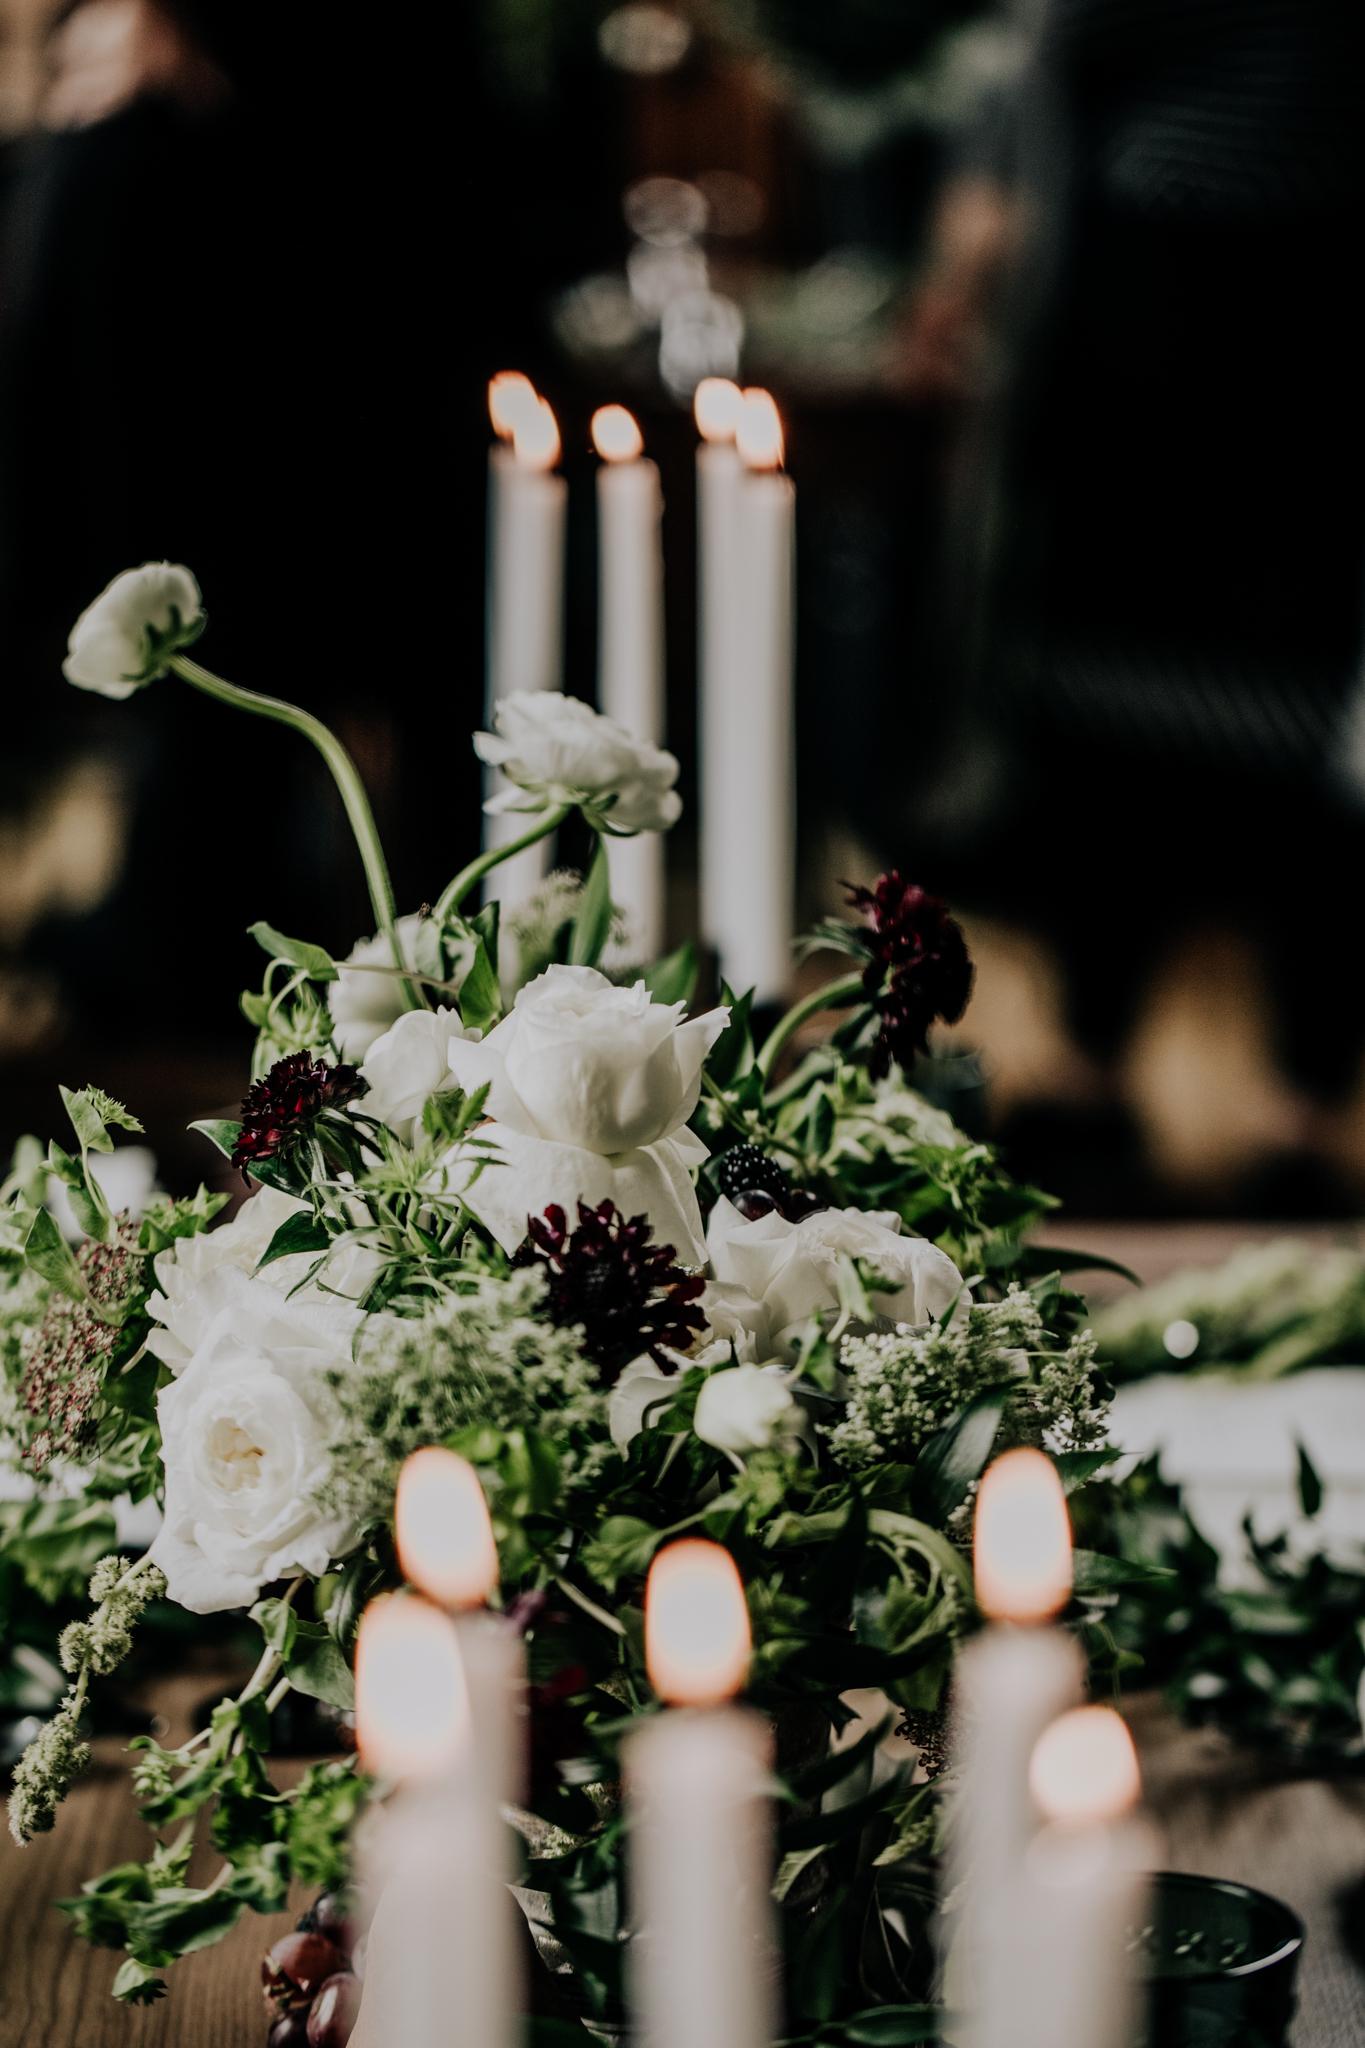 Jennifer Joyce Floral Designs - Greenery & Candles Wedding - Table Decor - Magnolia Market Place settings - Hove Photography